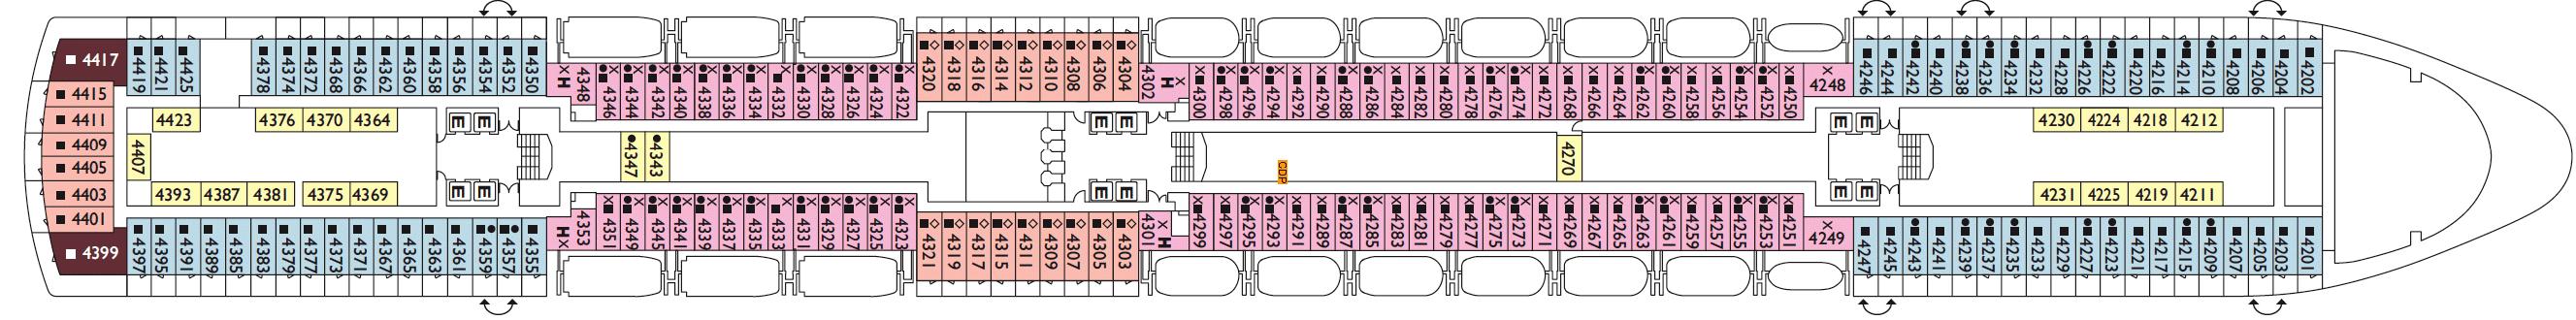 Costa Cruises Costa Deliziosa Deck Plans Camelia.png